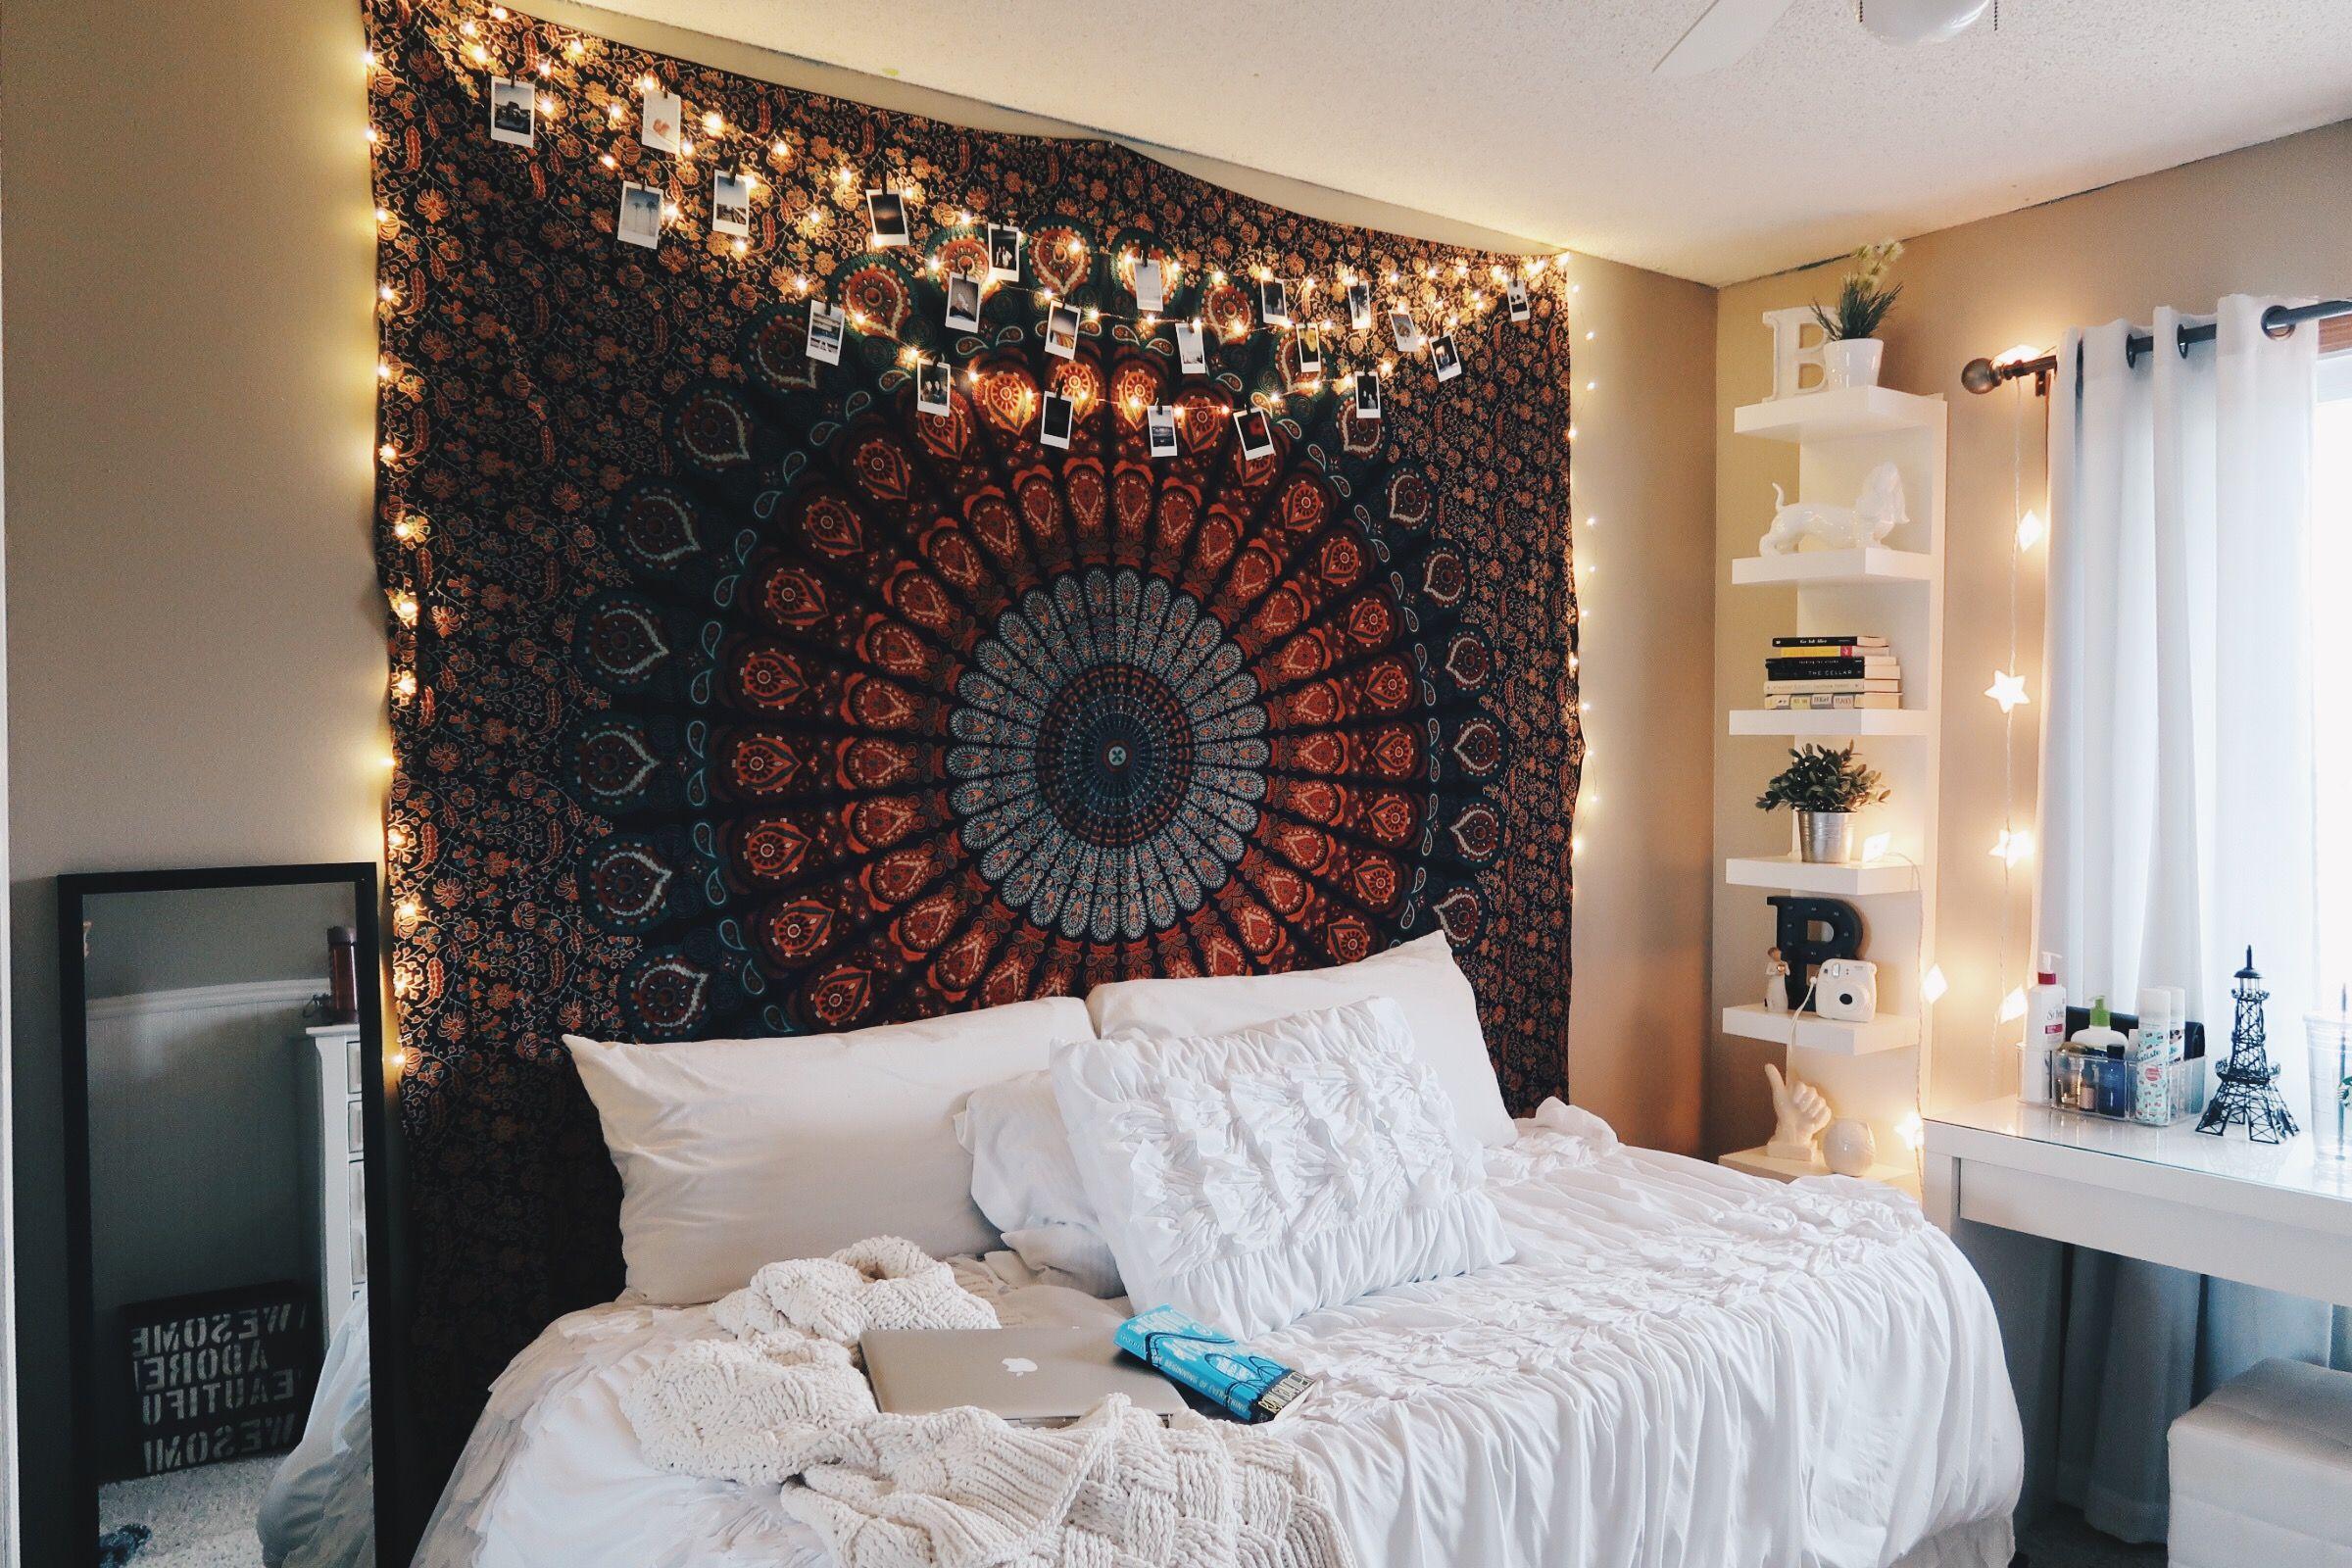 Sunflowerintheclouds In 2019 Room Room Decor Bedroom Decor